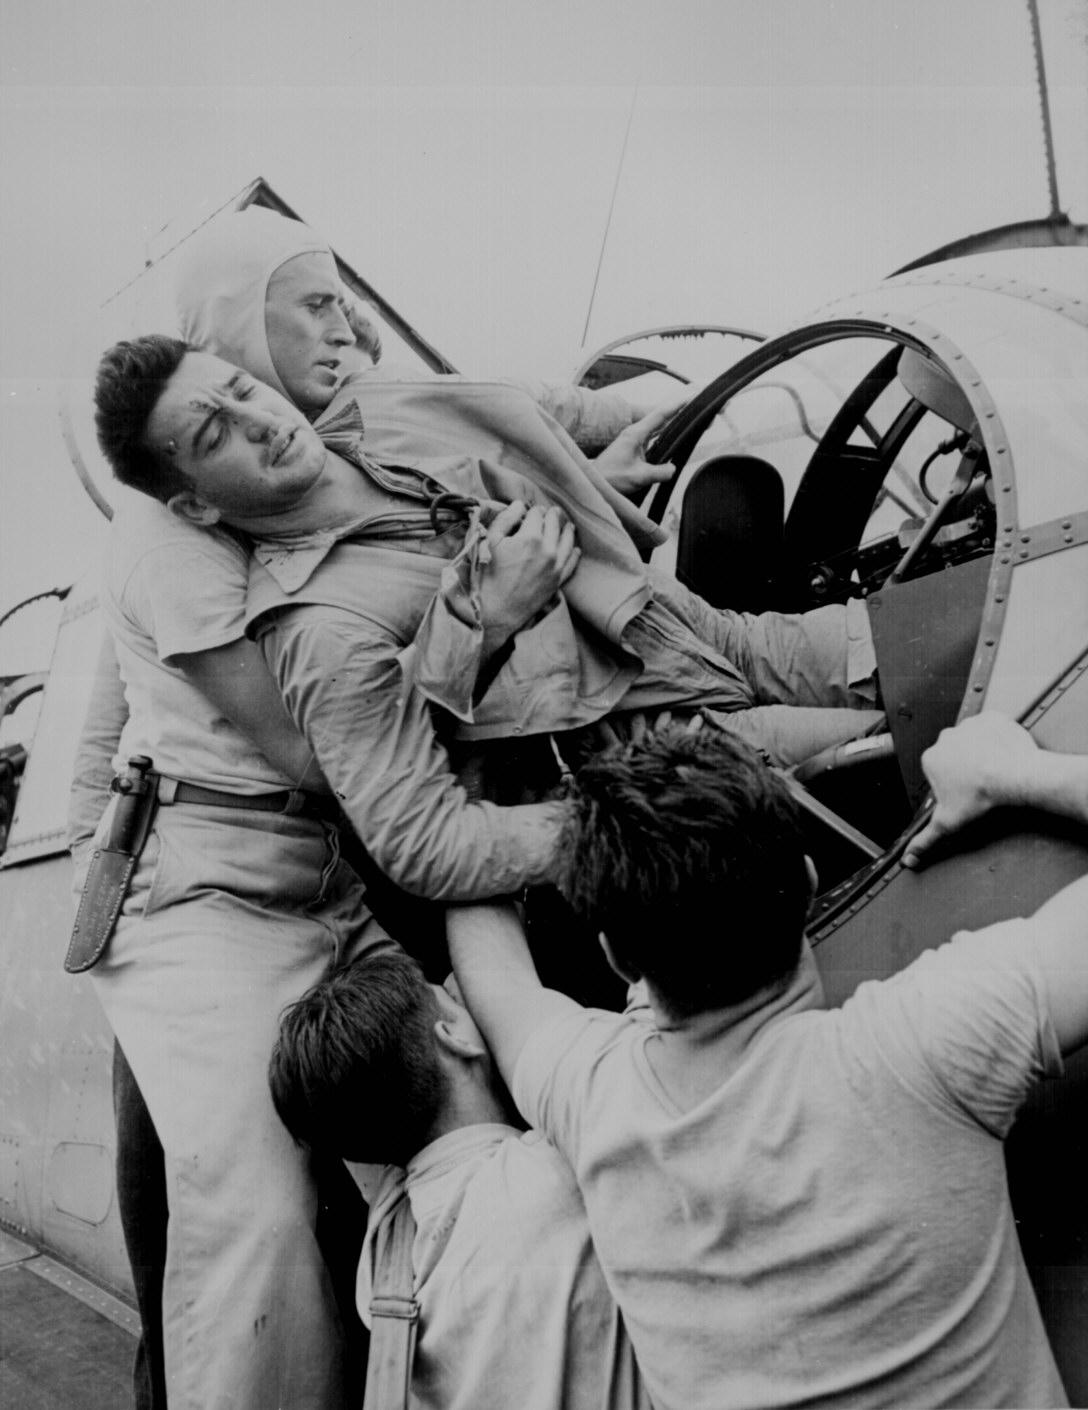 Wounded Turret Gunner, 1943